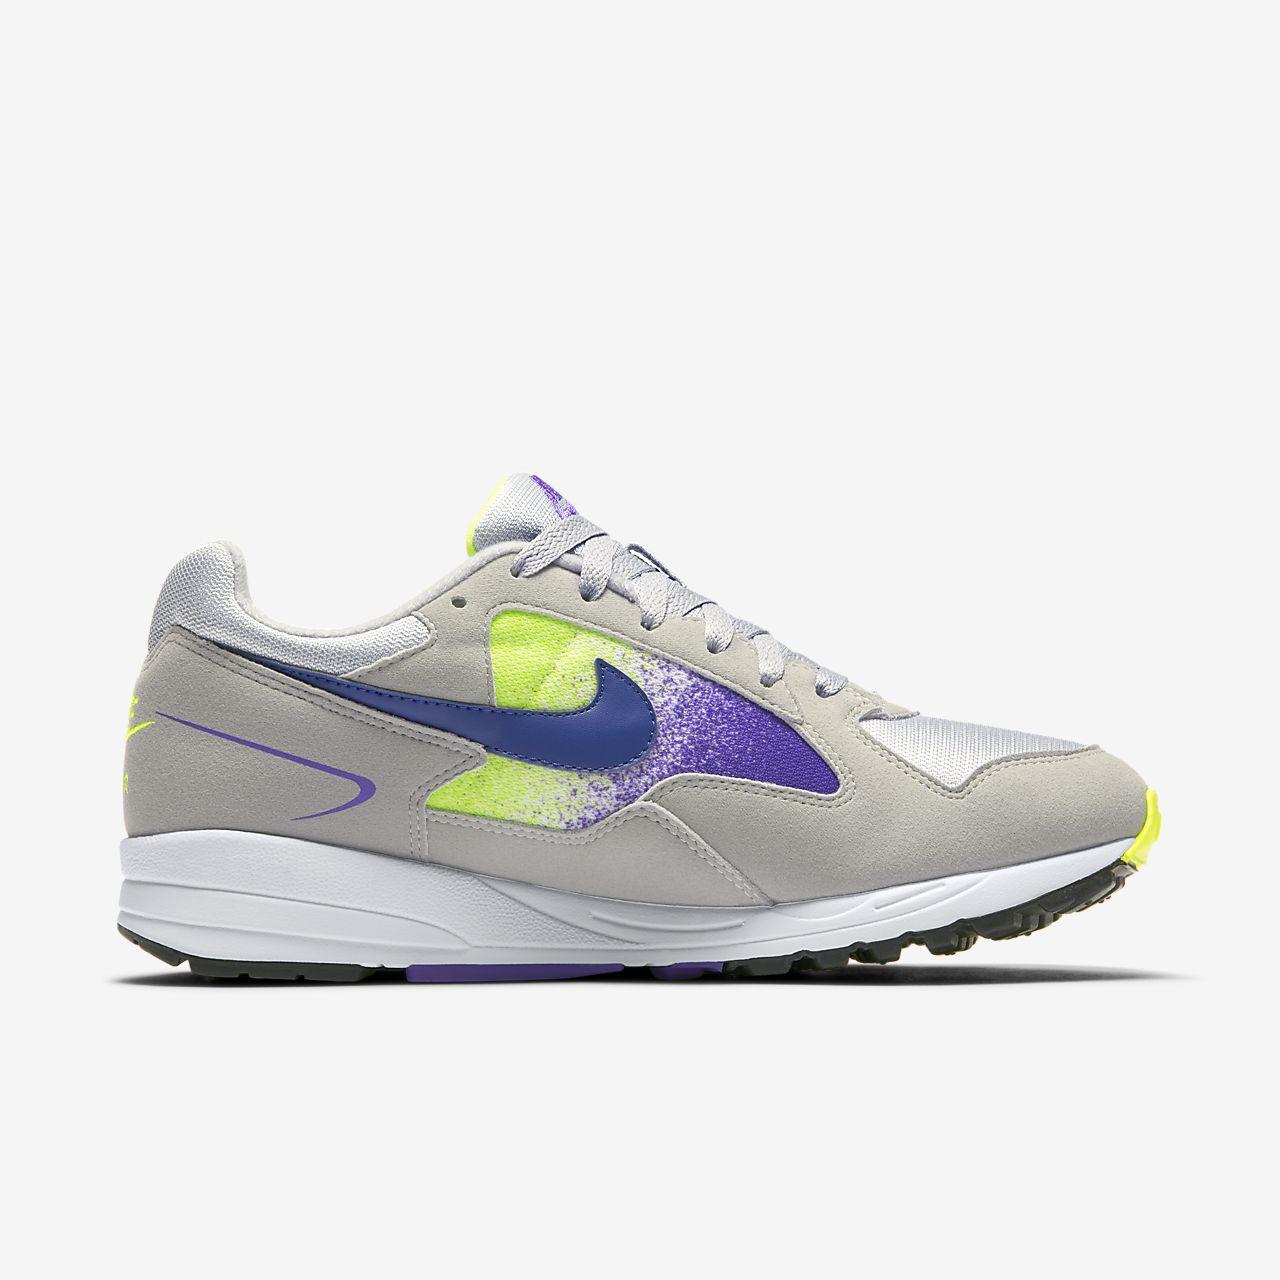 meet d8fd5 903ad ... Scarpa Nike Air Skylon II - Uomo